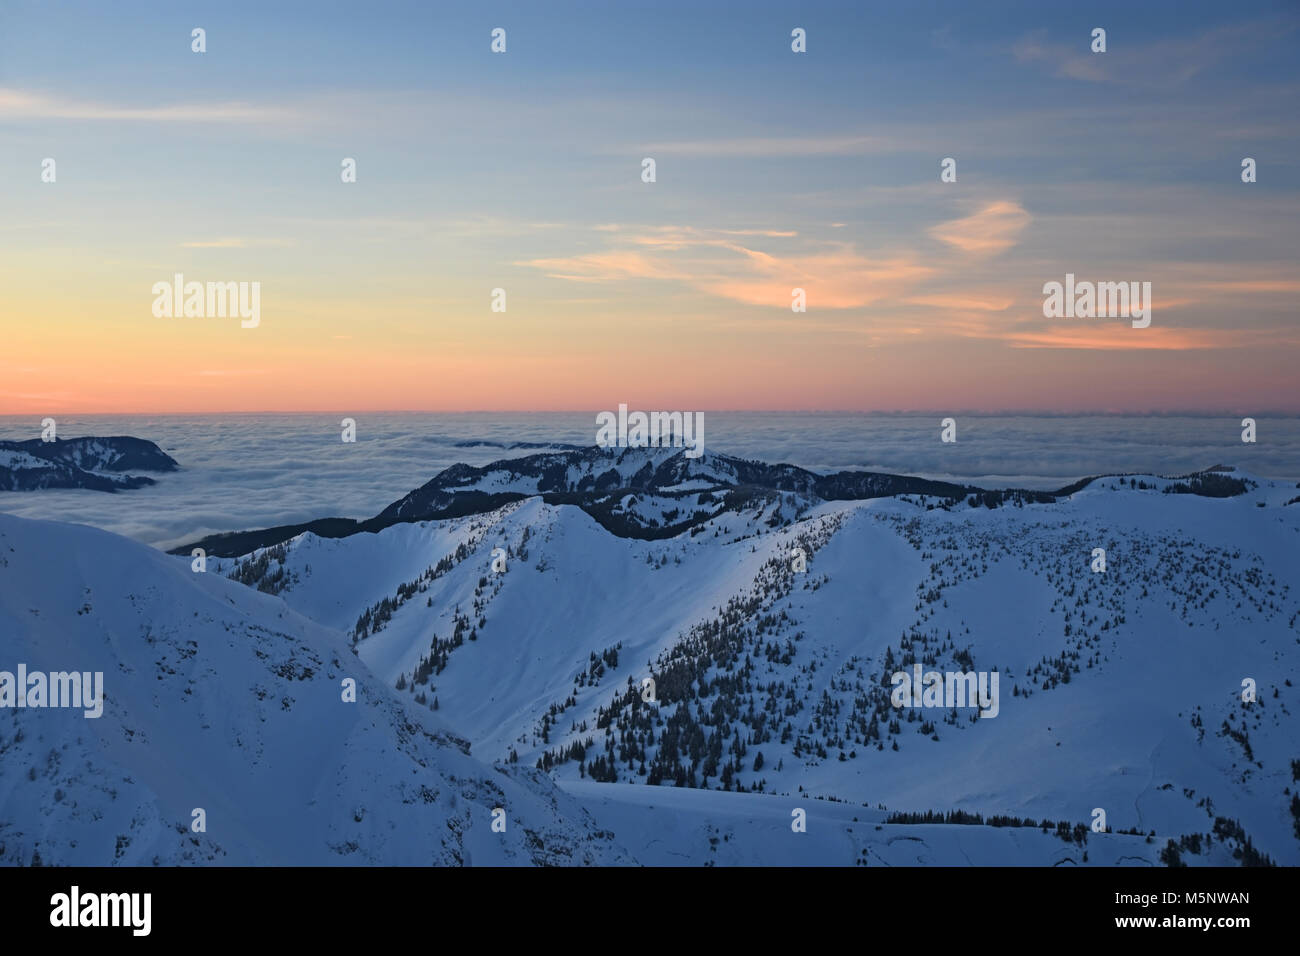 Colorful sunset at the summit of Ponten mountain in winter. View to Grünten mountain. Allgaeu Alps, Bavaria, Germany Stock Photo